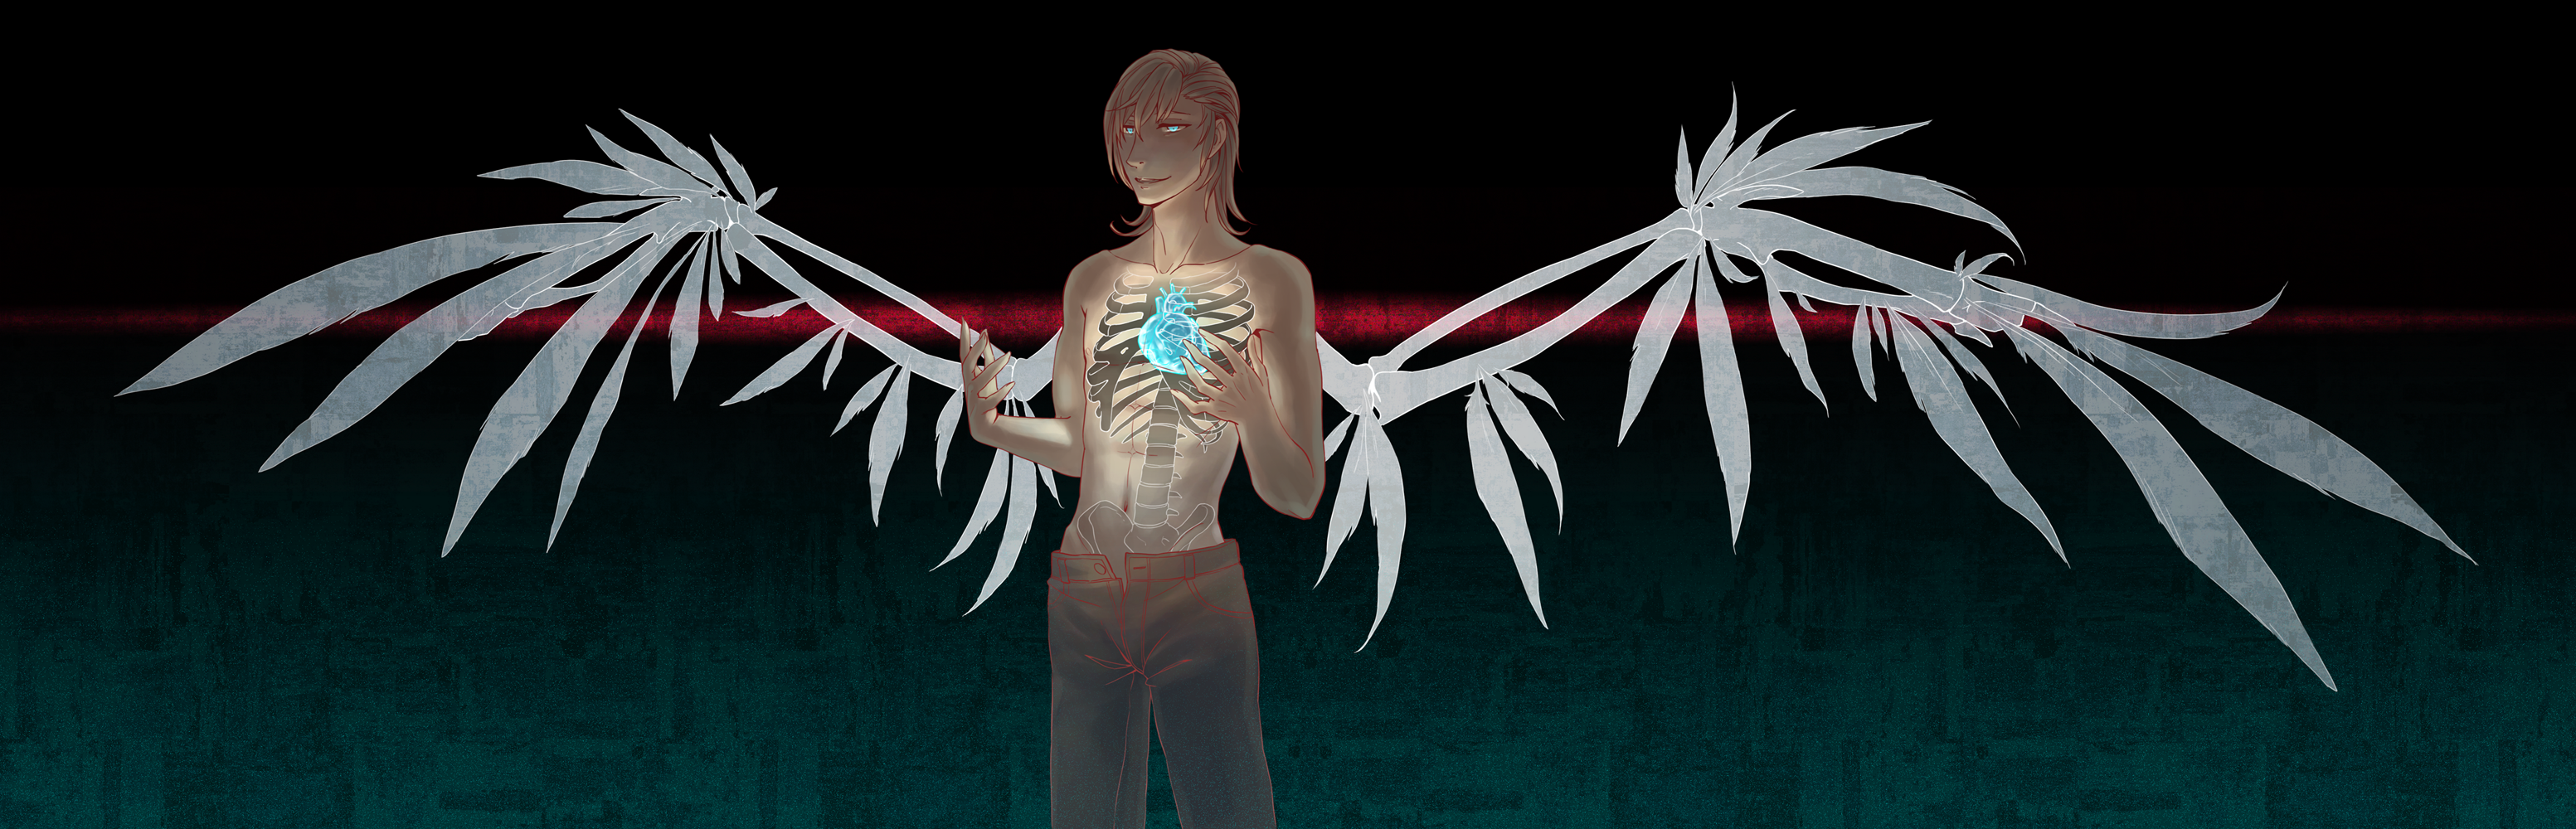 MS :: Wings by yaocchi